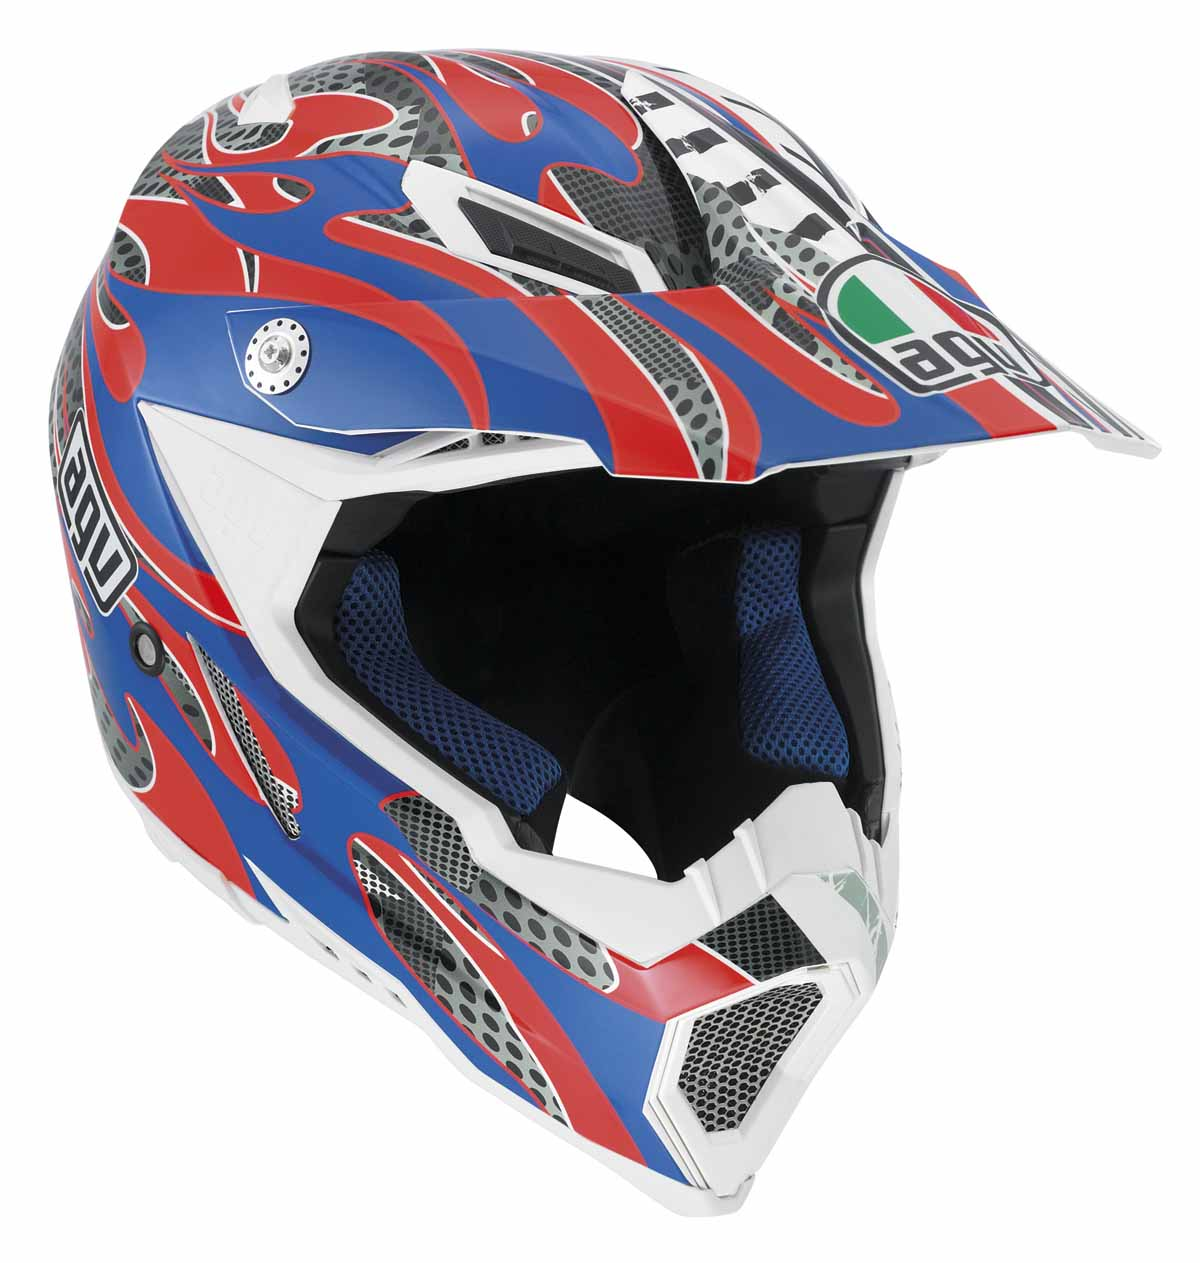 AGV AX-8 EVO Flame MX Offroad Helmet Blue/Red LG